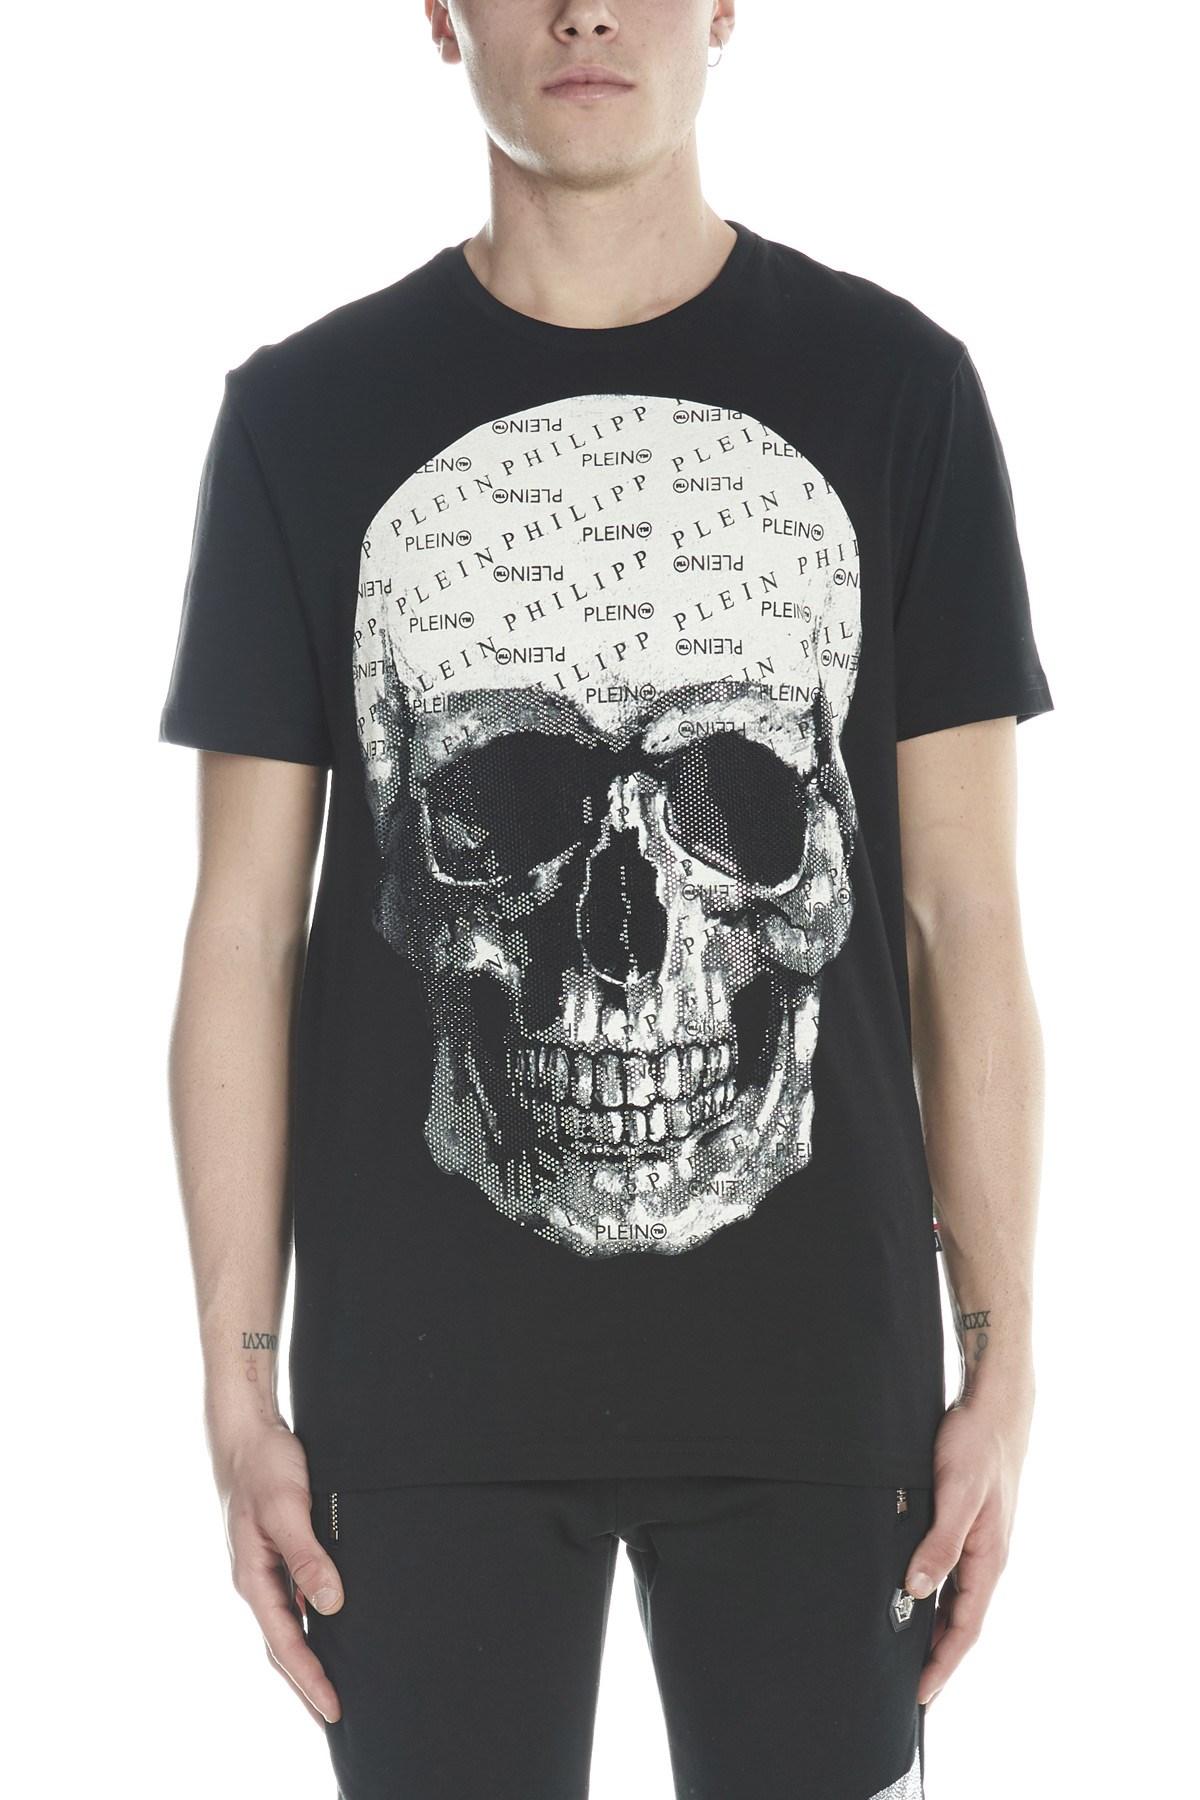 79f97fc6112 philipp plein  Skull  t-shirt available on julian-fashion.com - 63232